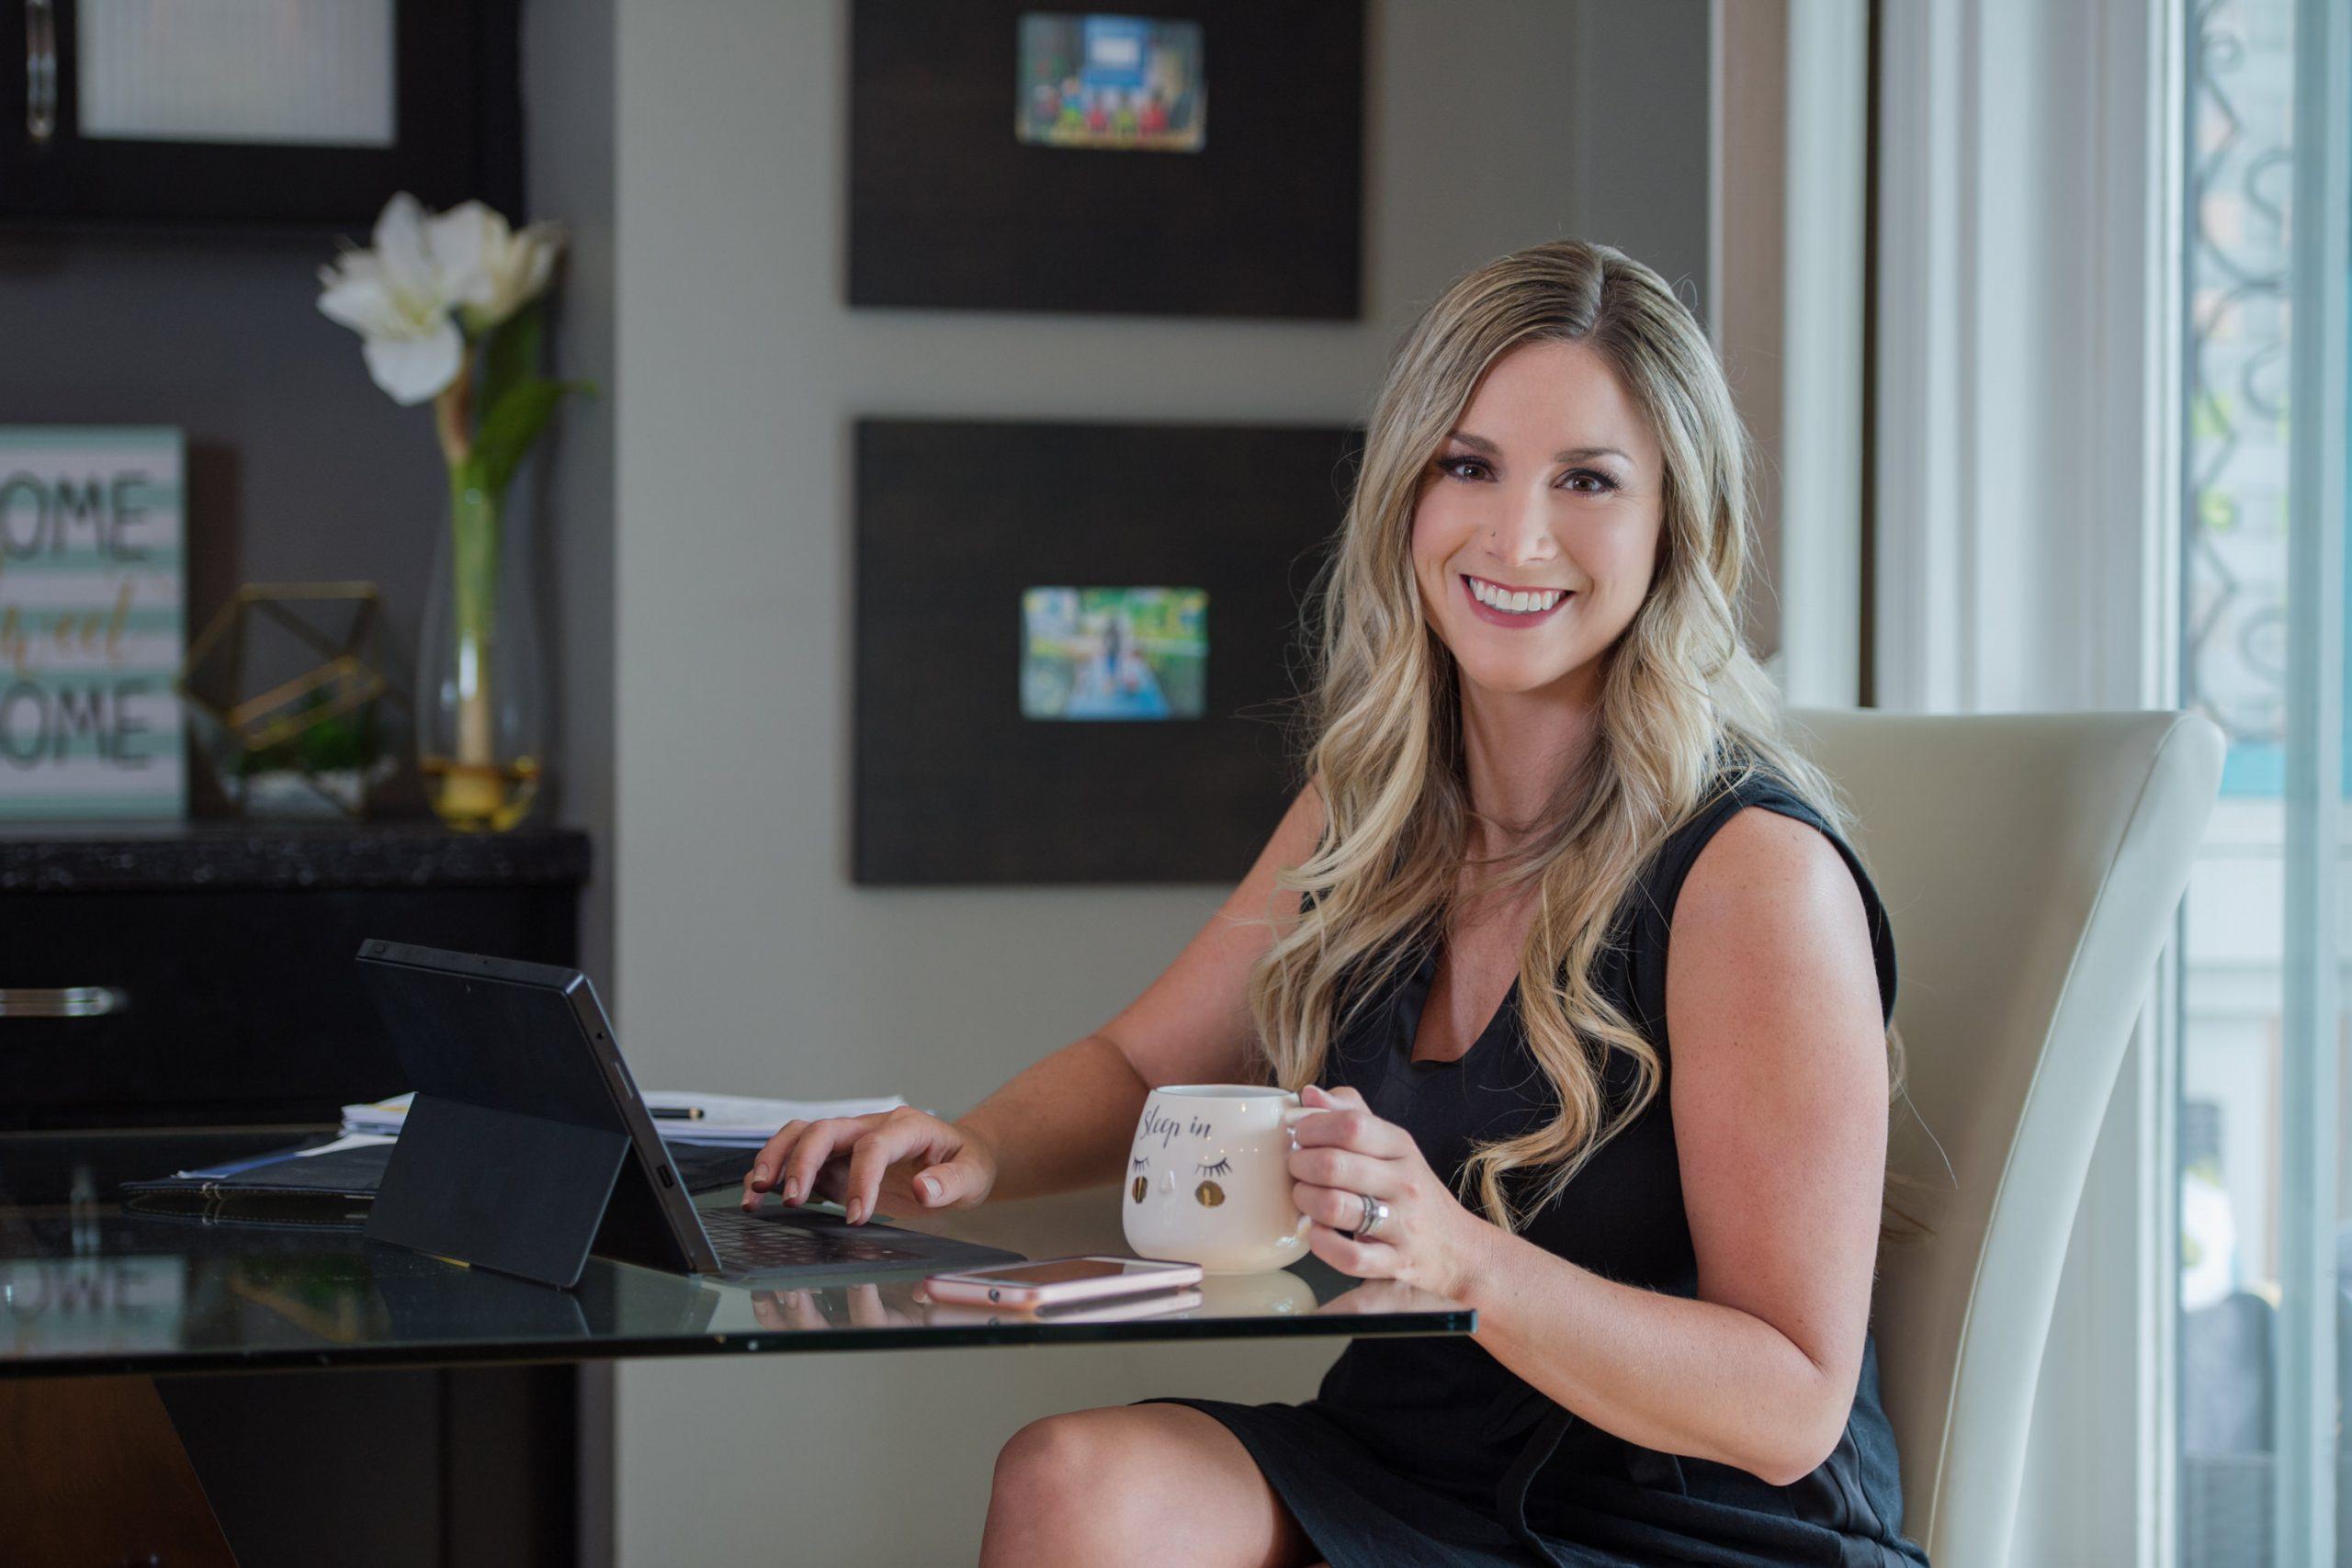 Kamloops headshot photographer for entrepreneurs and business women Realtor